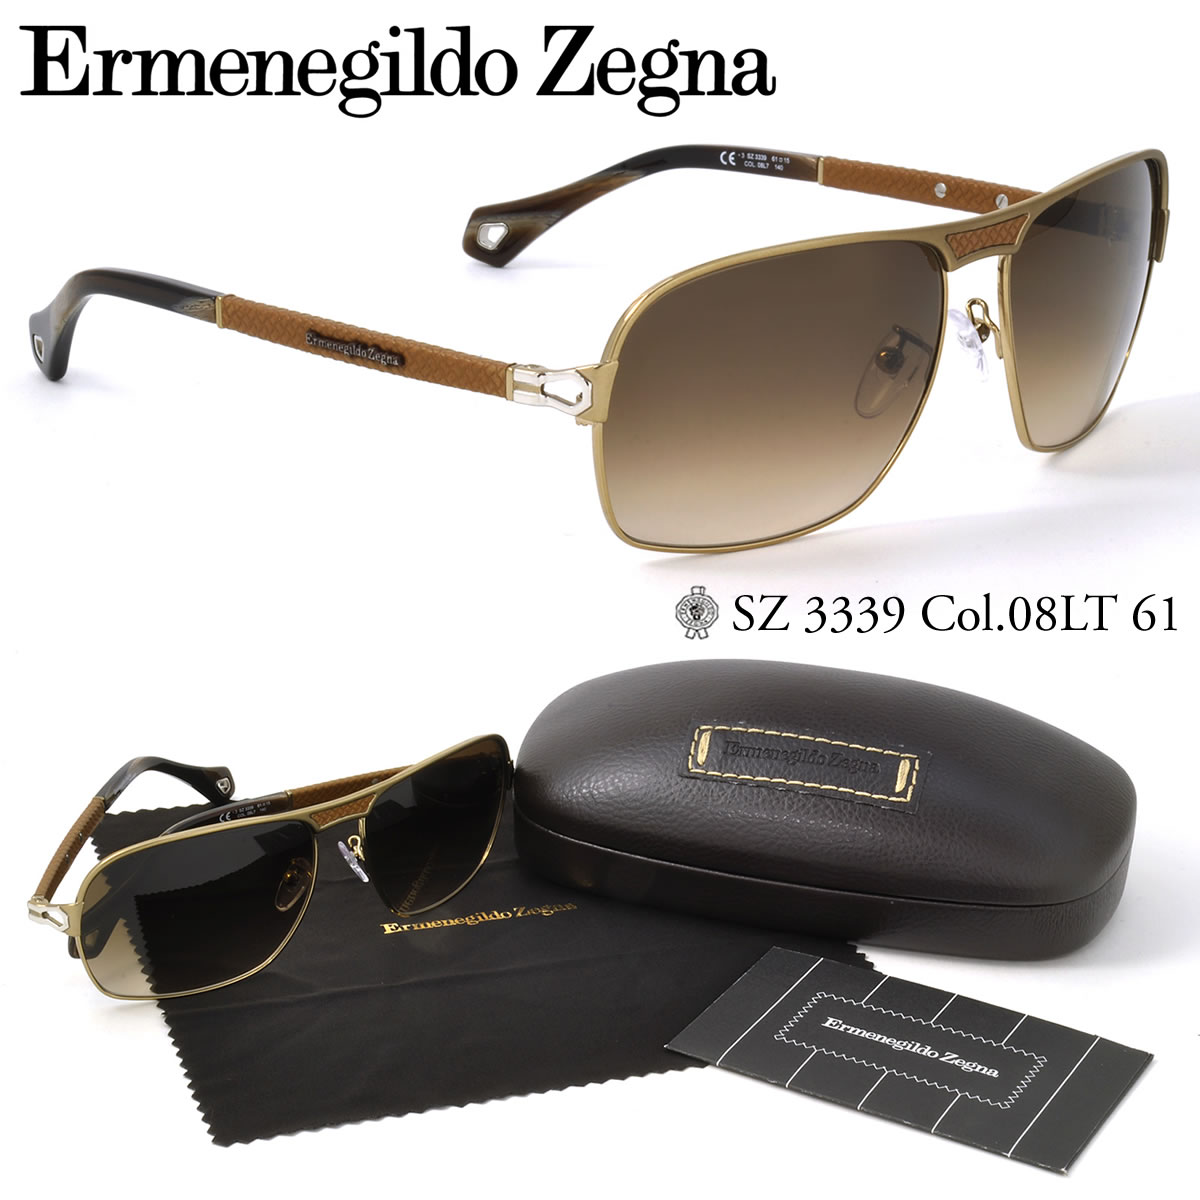 Ermenegildo Zegna SZ3339 08L7 61